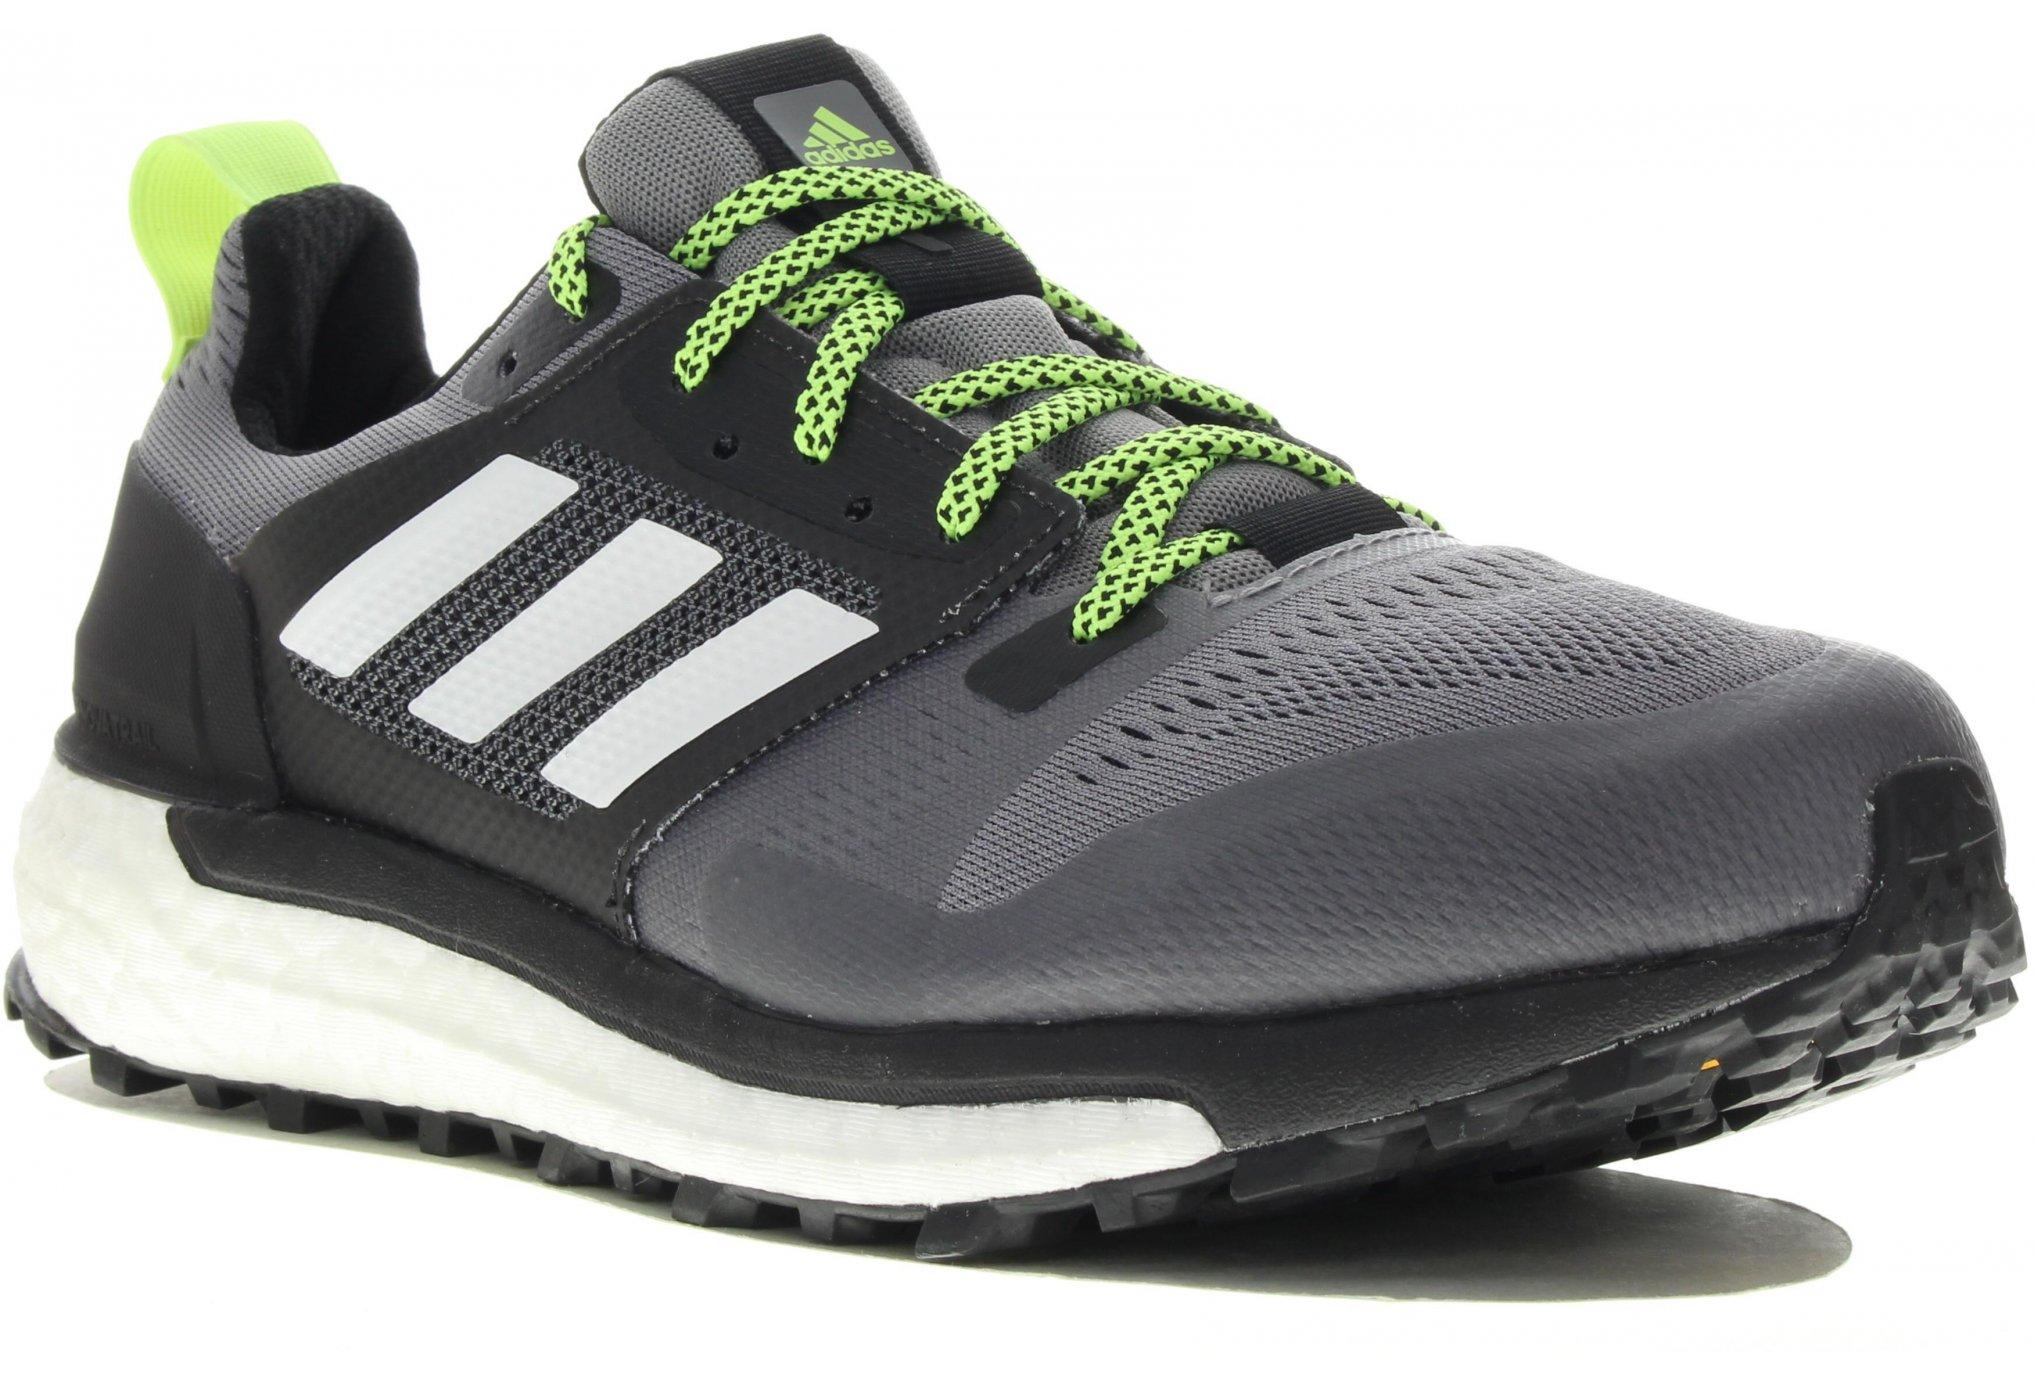 meilleur service c5698 31e37 adidas Supernova Trail M Chaussures homme - Trails Endurance Mag